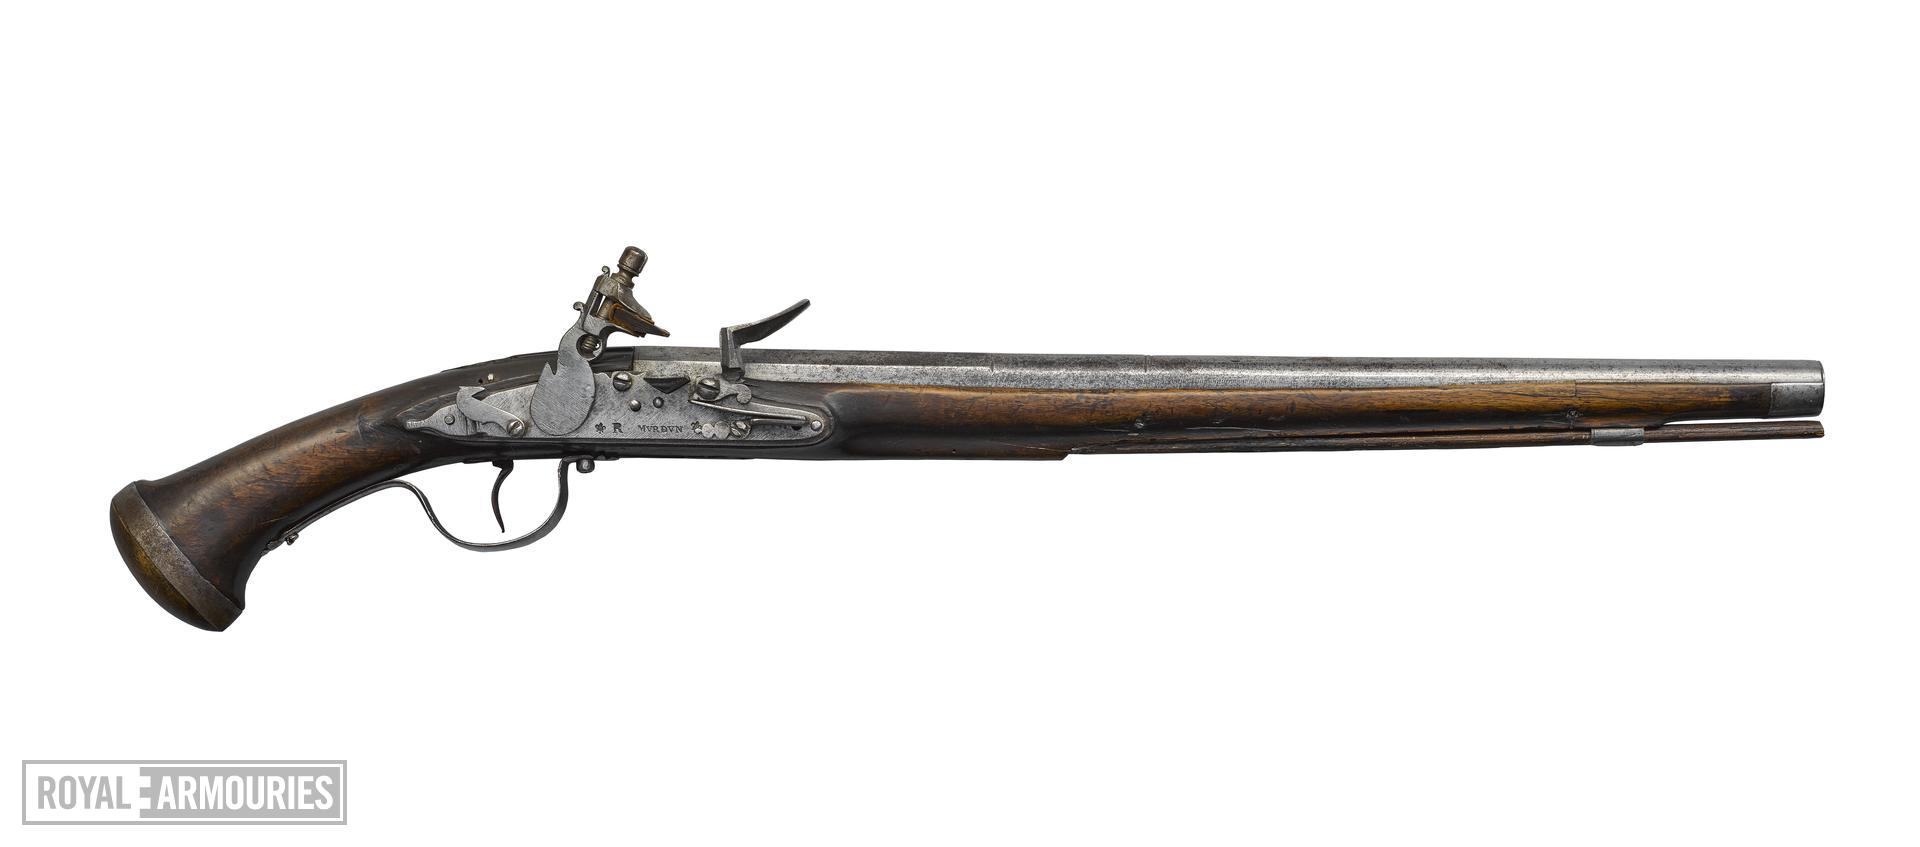 Flintlock pistol By Murden. Littlecote collection. XII.5414